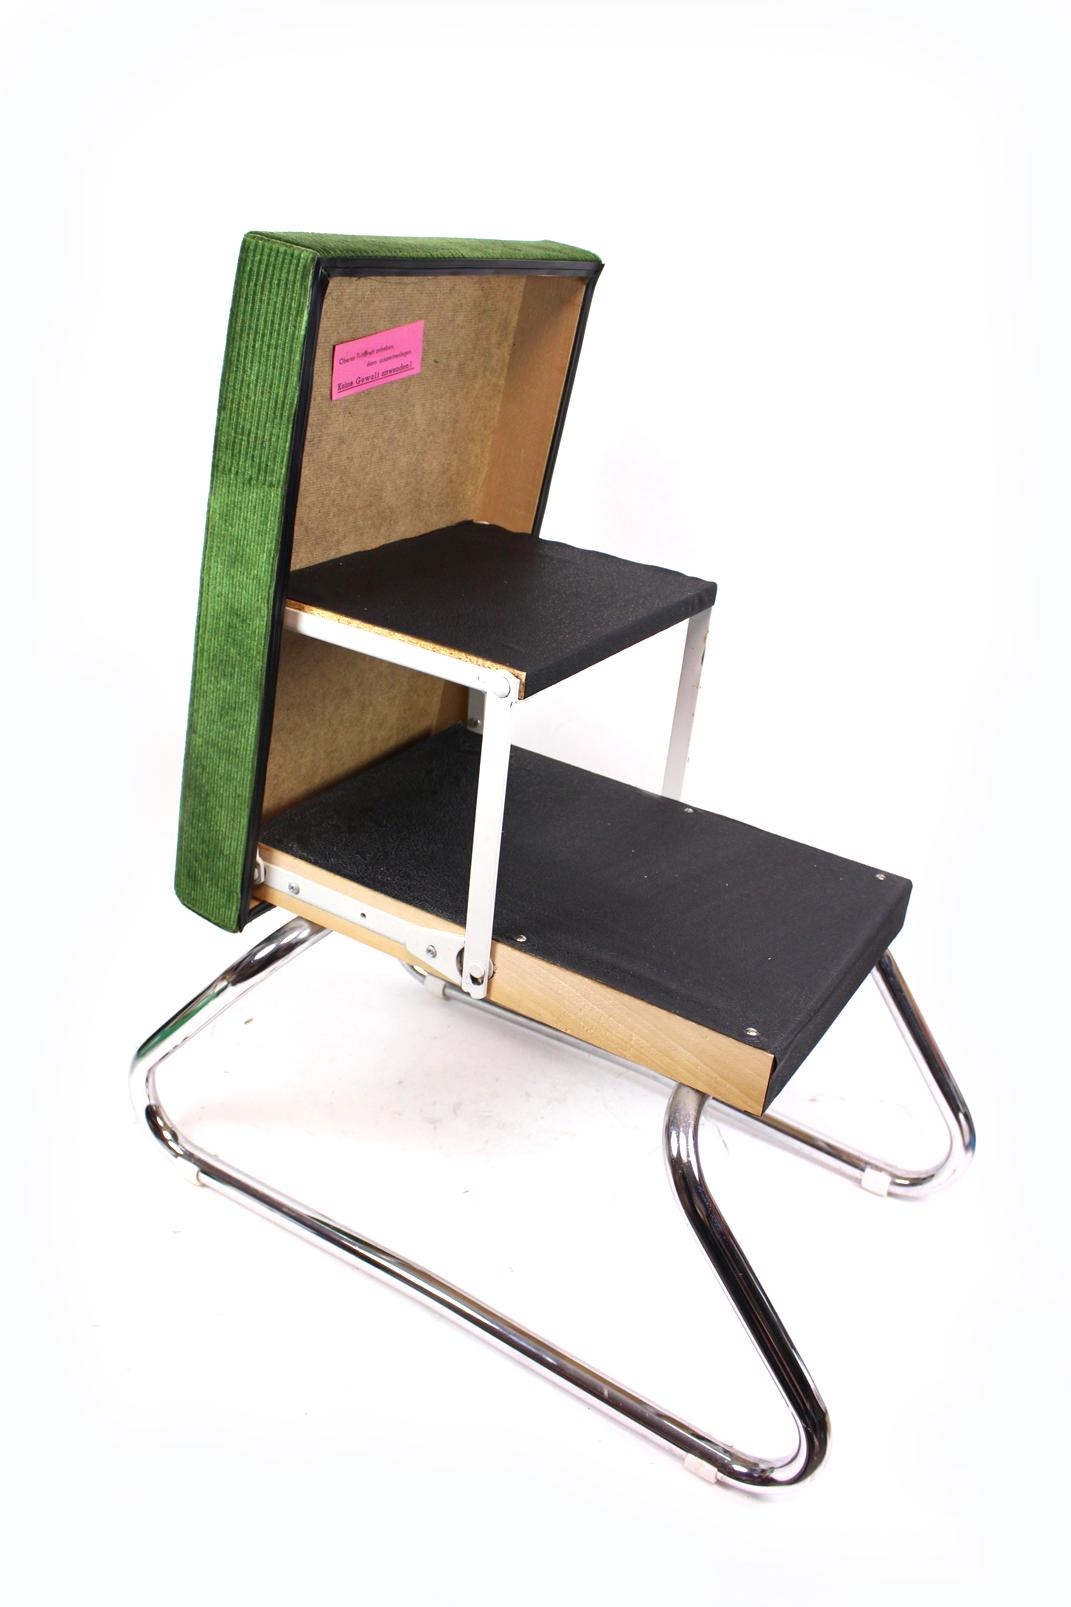 alter ddr stufenhocker gr n trittleiter polsterhocker fu bank hocker leiter. Black Bedroom Furniture Sets. Home Design Ideas